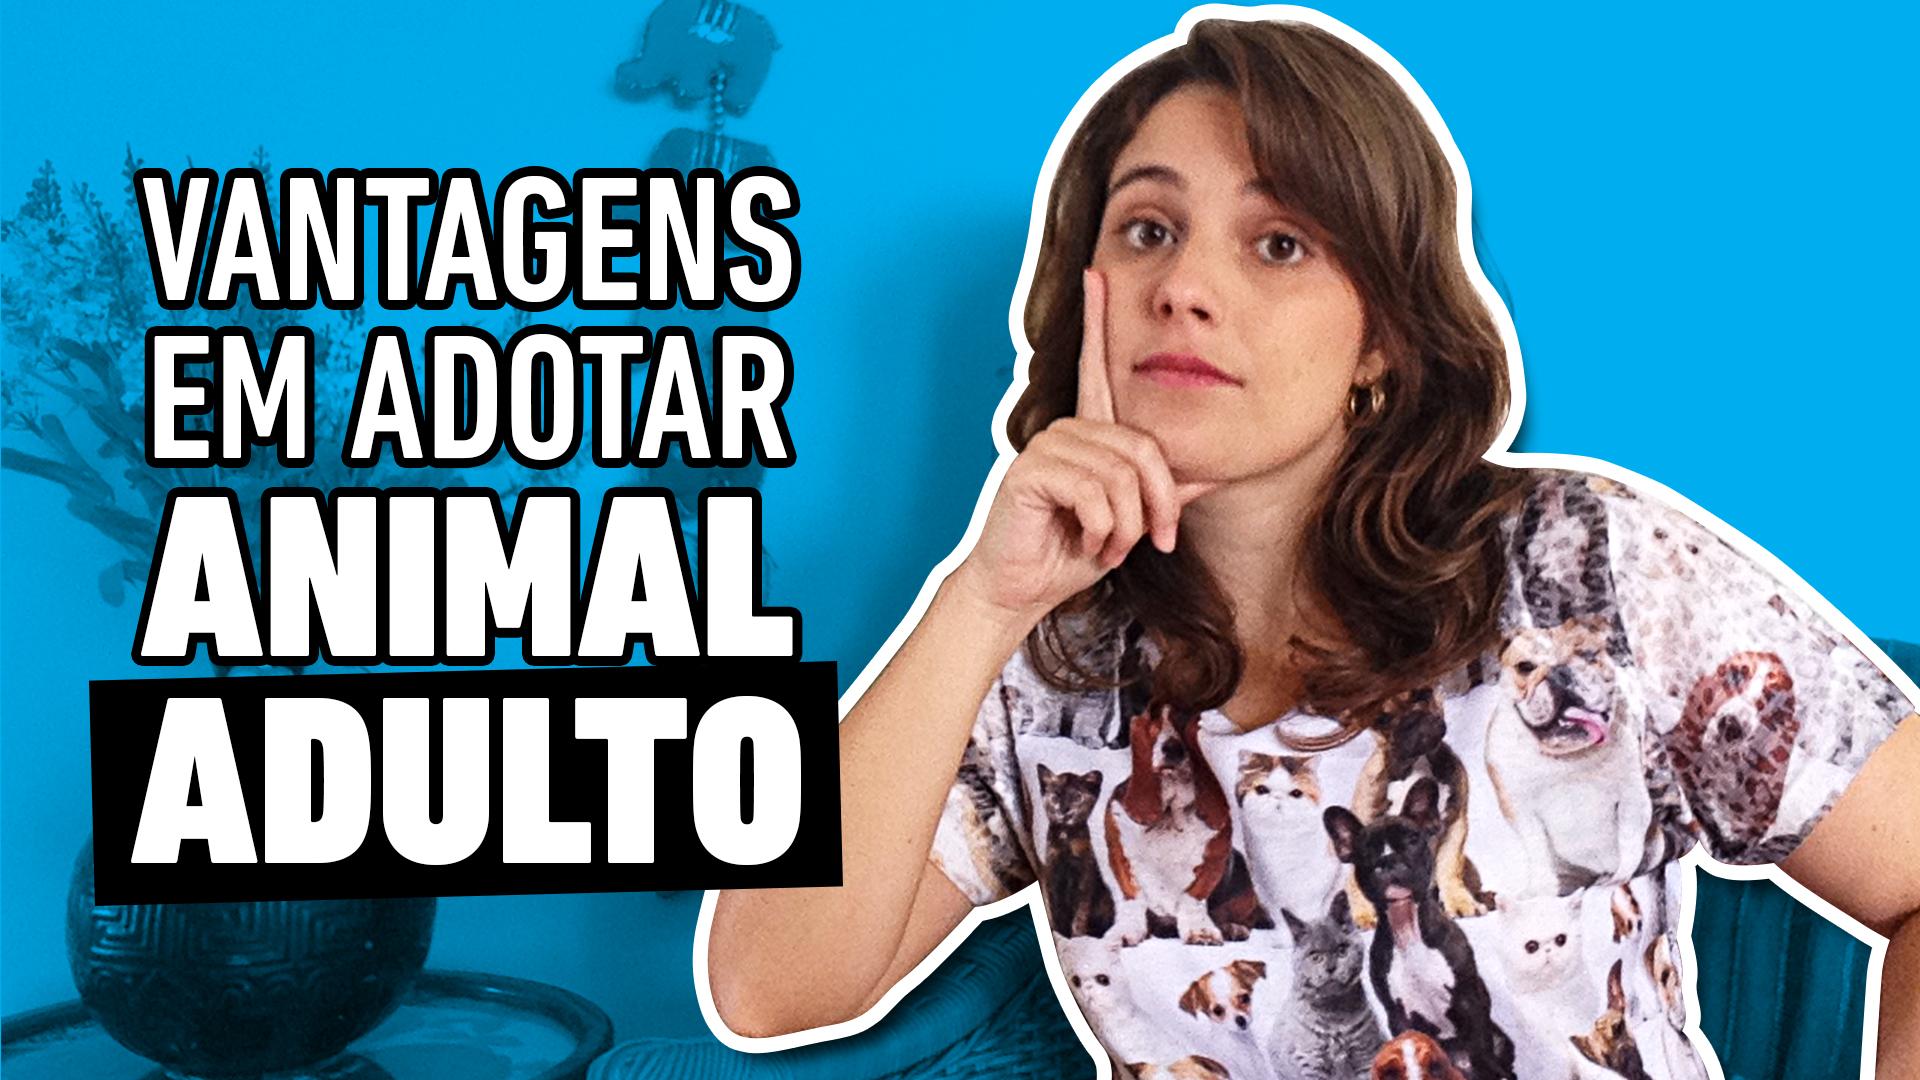 002_AUNIMAL_MATERIAIS_DE_YOUTUBE_ITEM02_CAPA_ADOTAR_ANIMAL_ADULTO